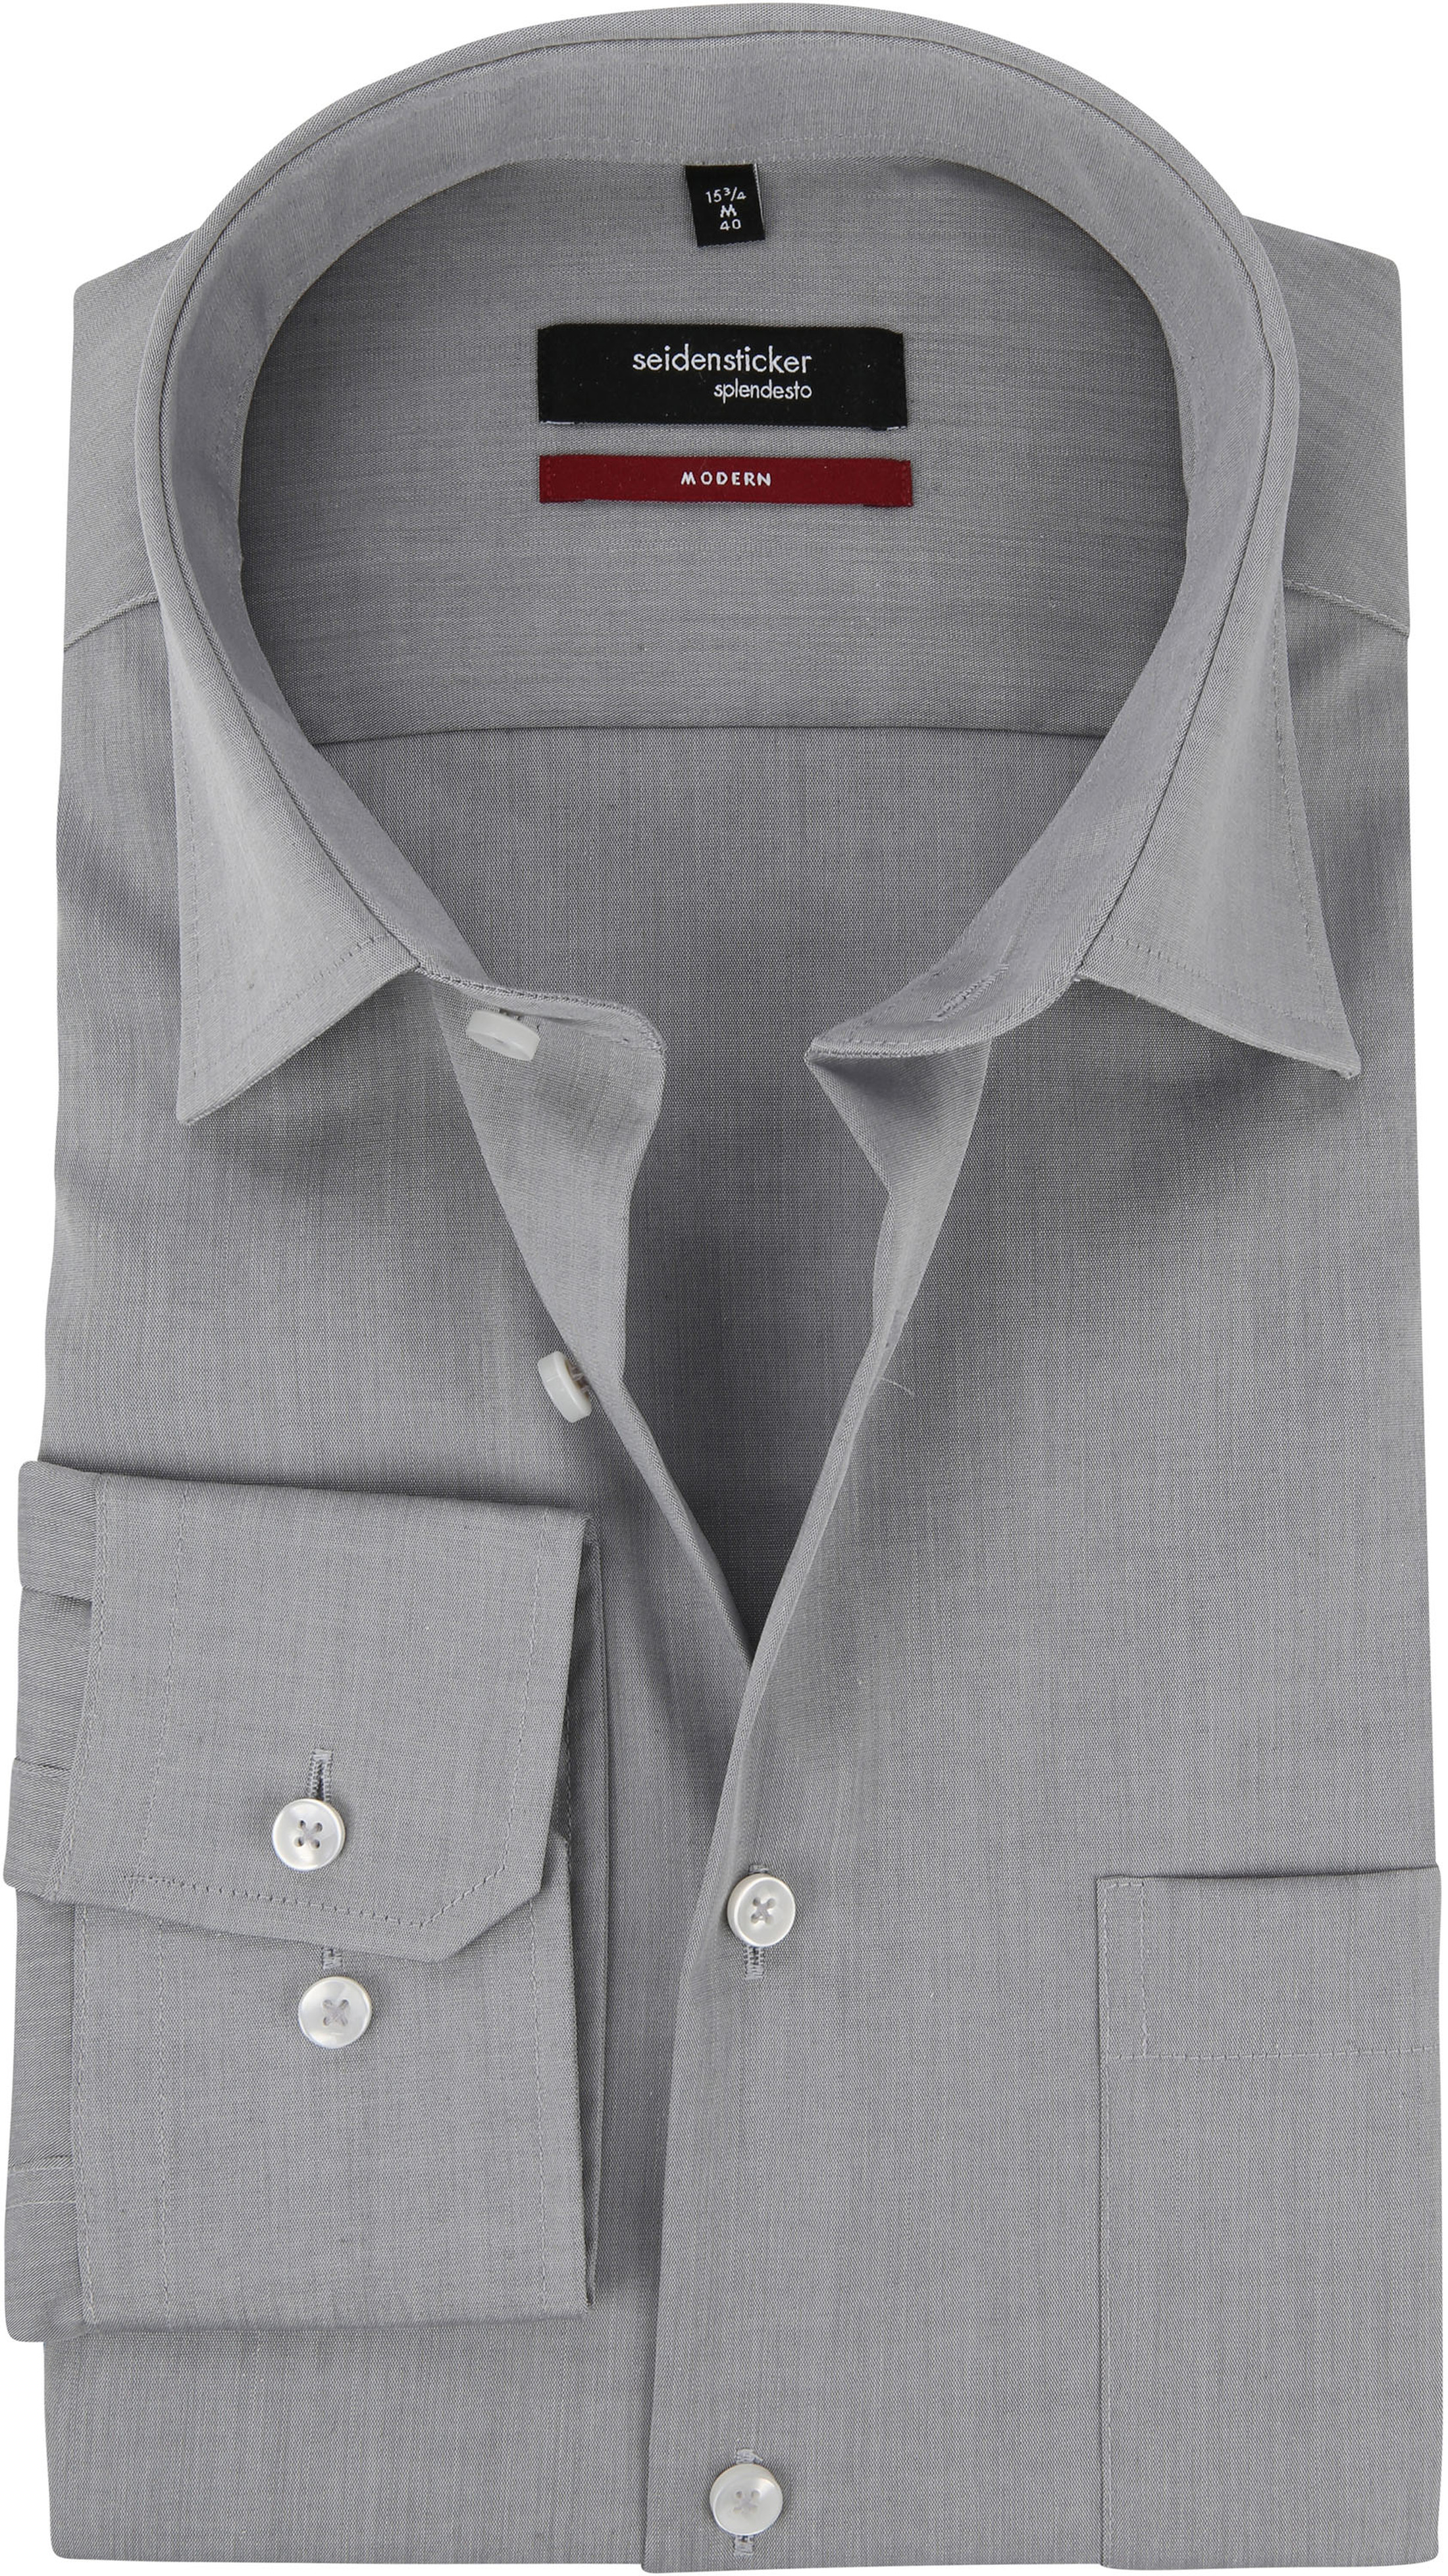 Seidensticker Strijkvrij Overhemd Grijs foto 0